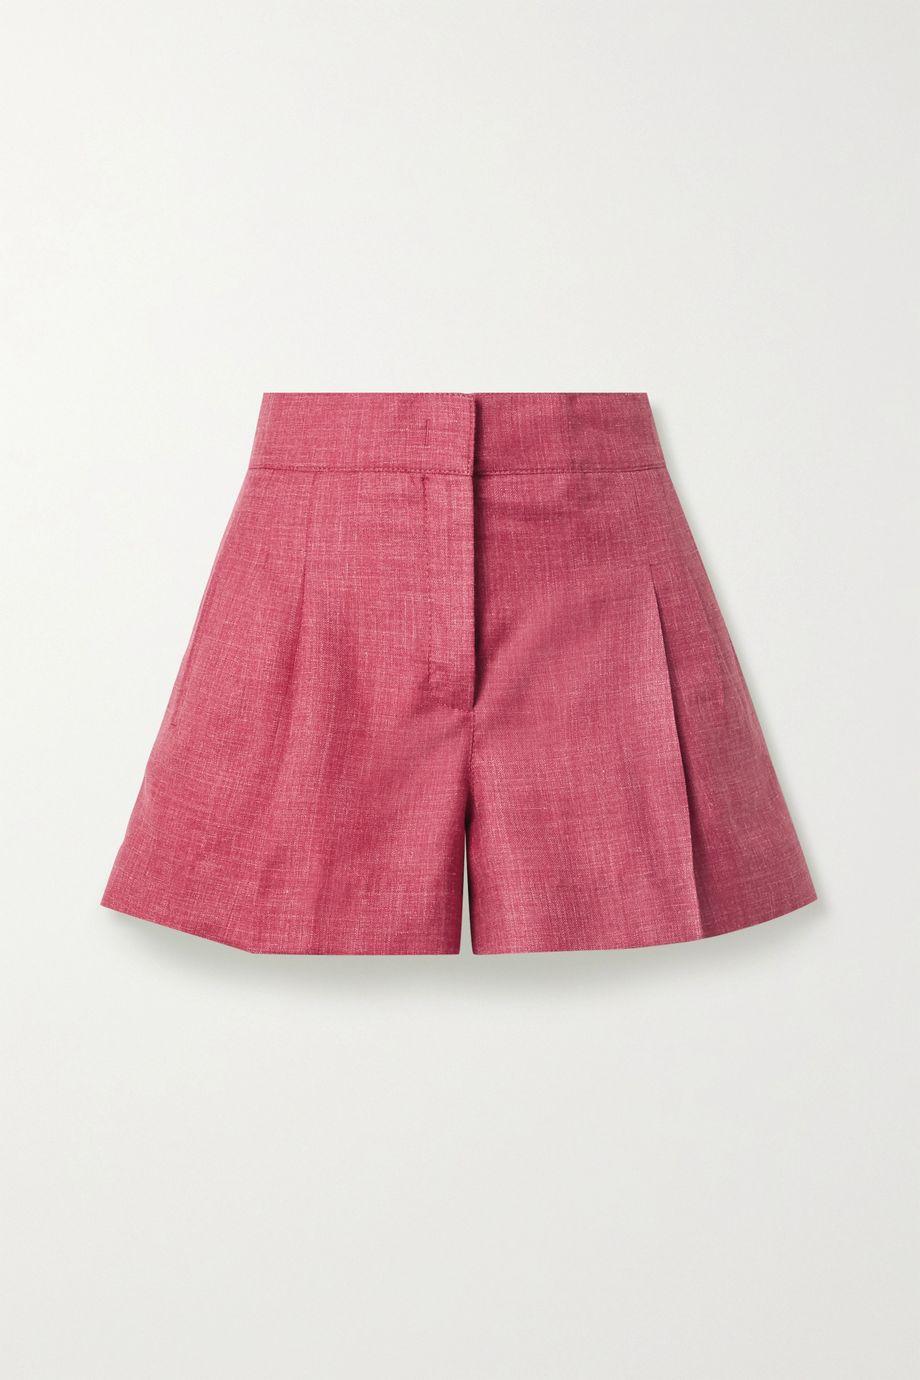 CASASOLA 【NET SUSTAIN】褶裥混色有机羊毛真丝亚麻混纺短裤